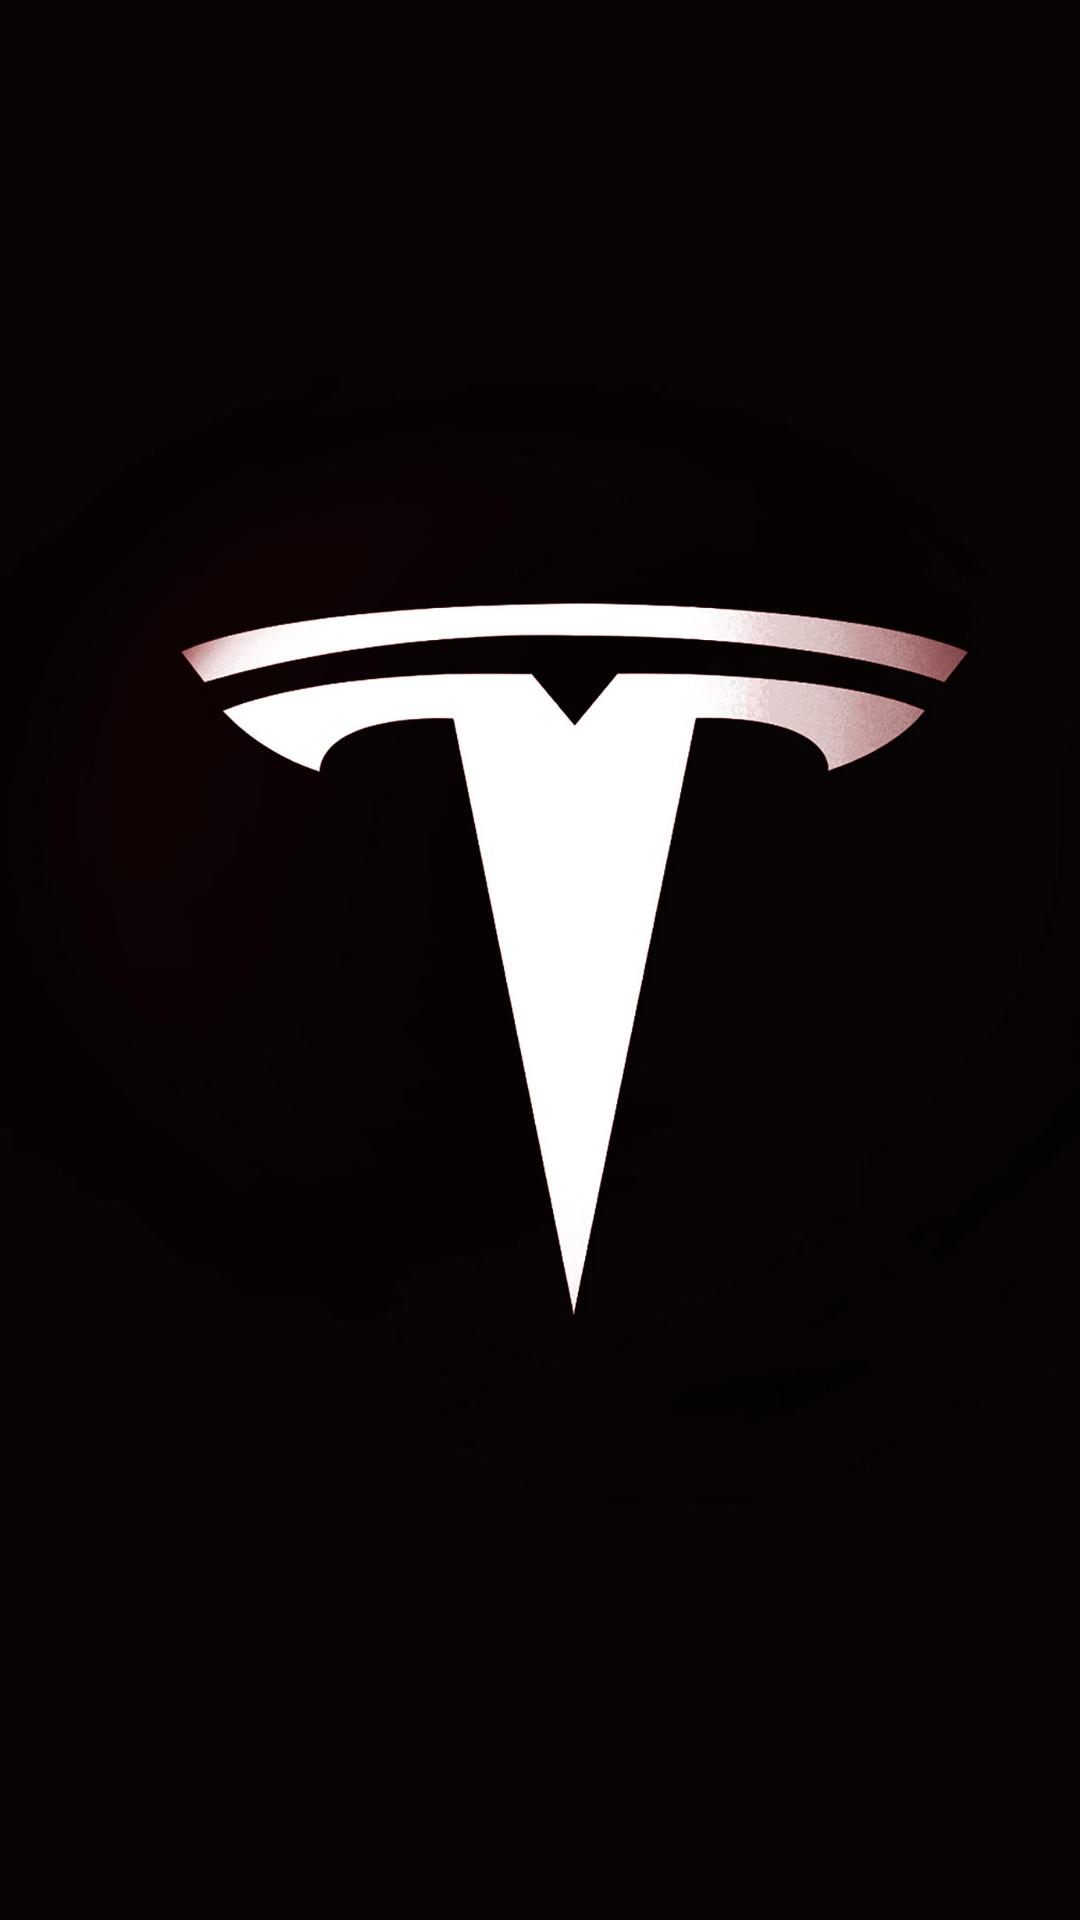 Tesla Iphone Wallpaper Hd